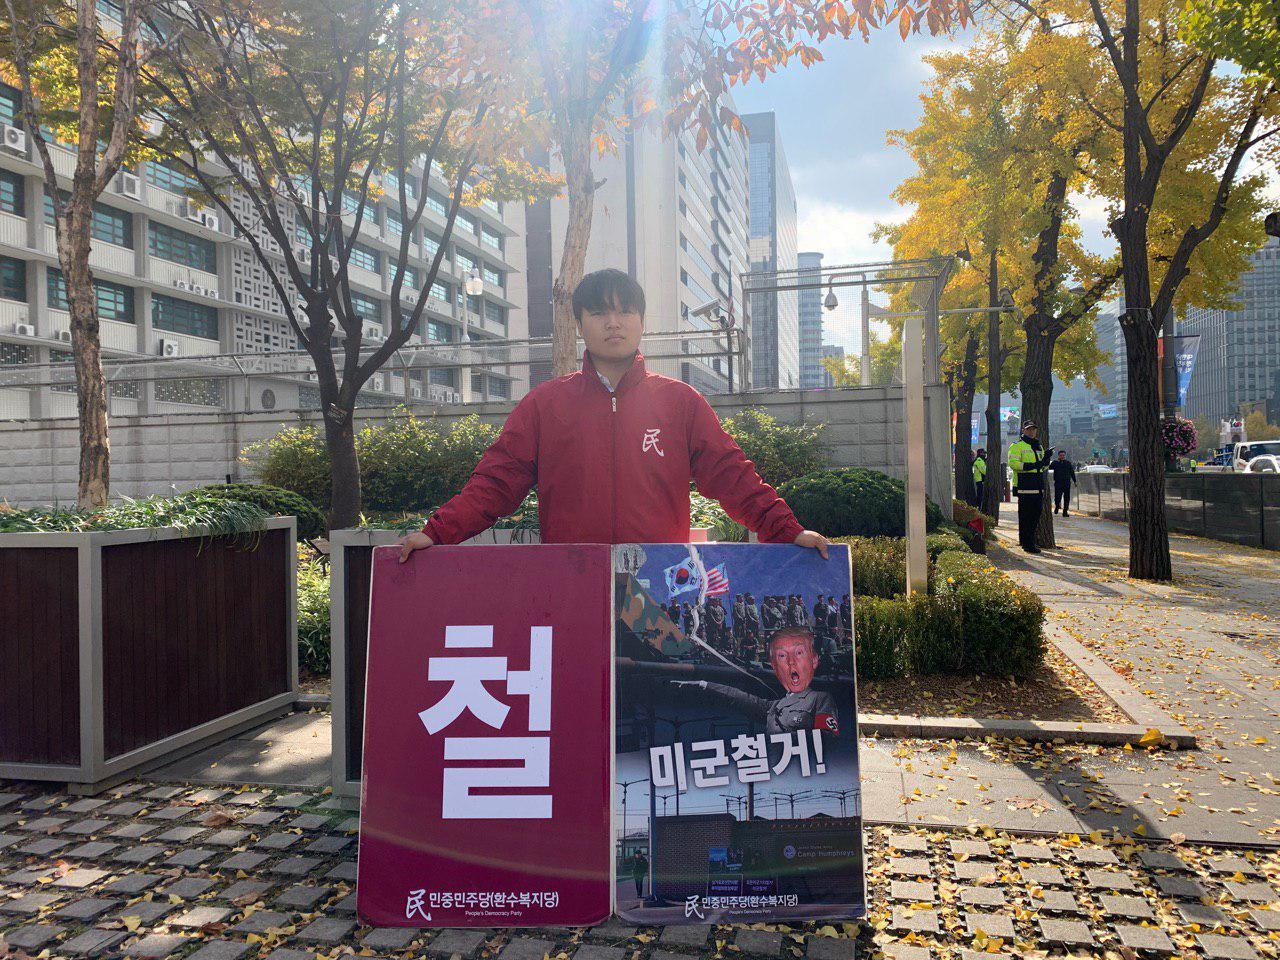 photo_2019-11-11_04-44-04.jpg